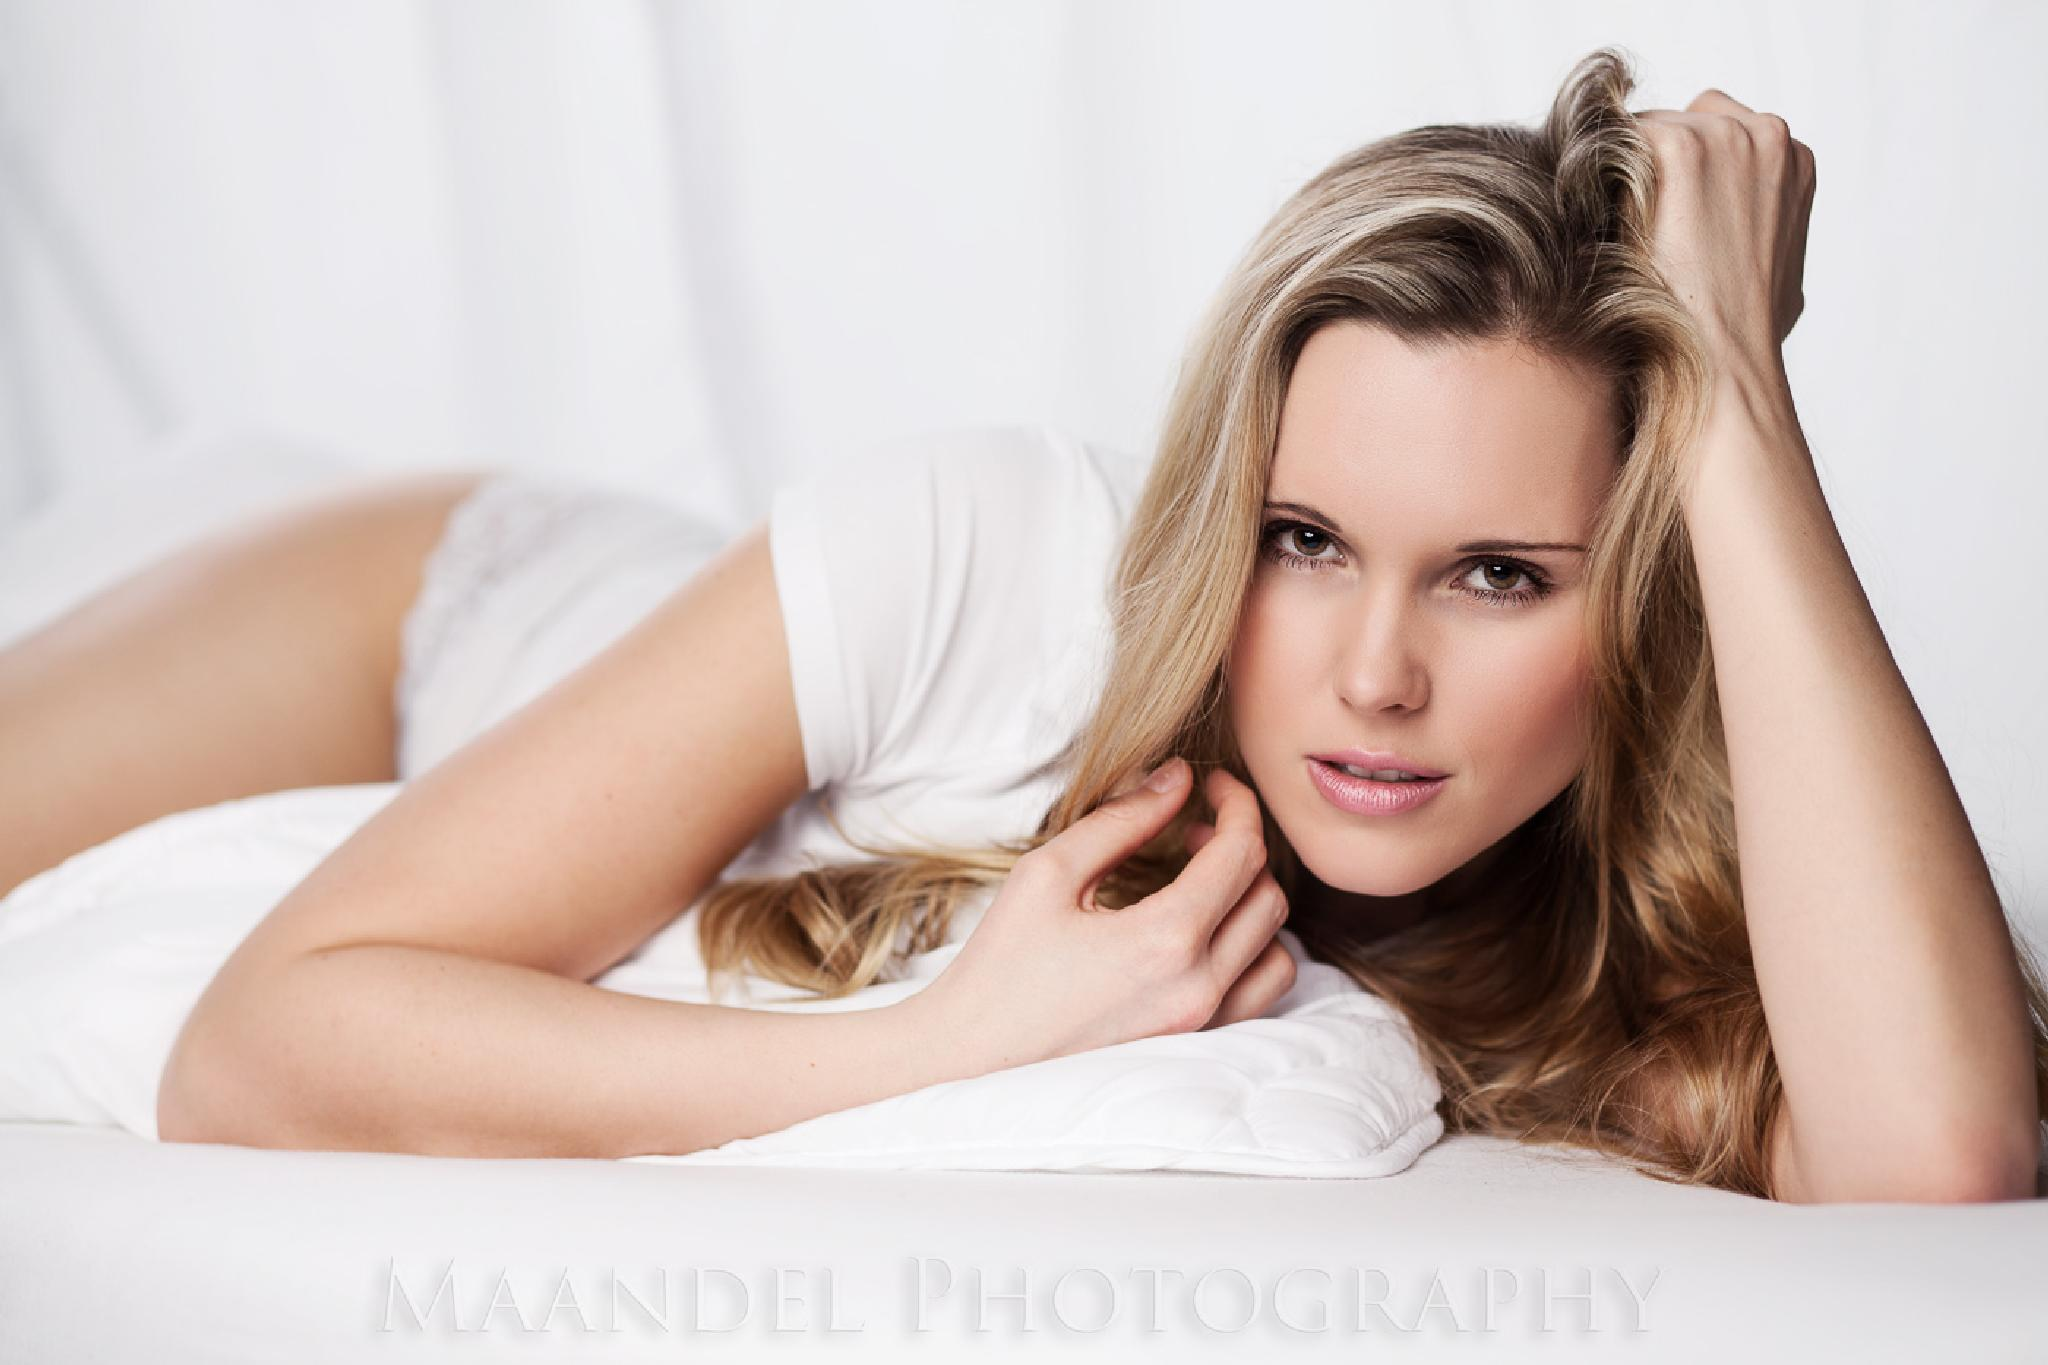 Tina by Maandel Photography